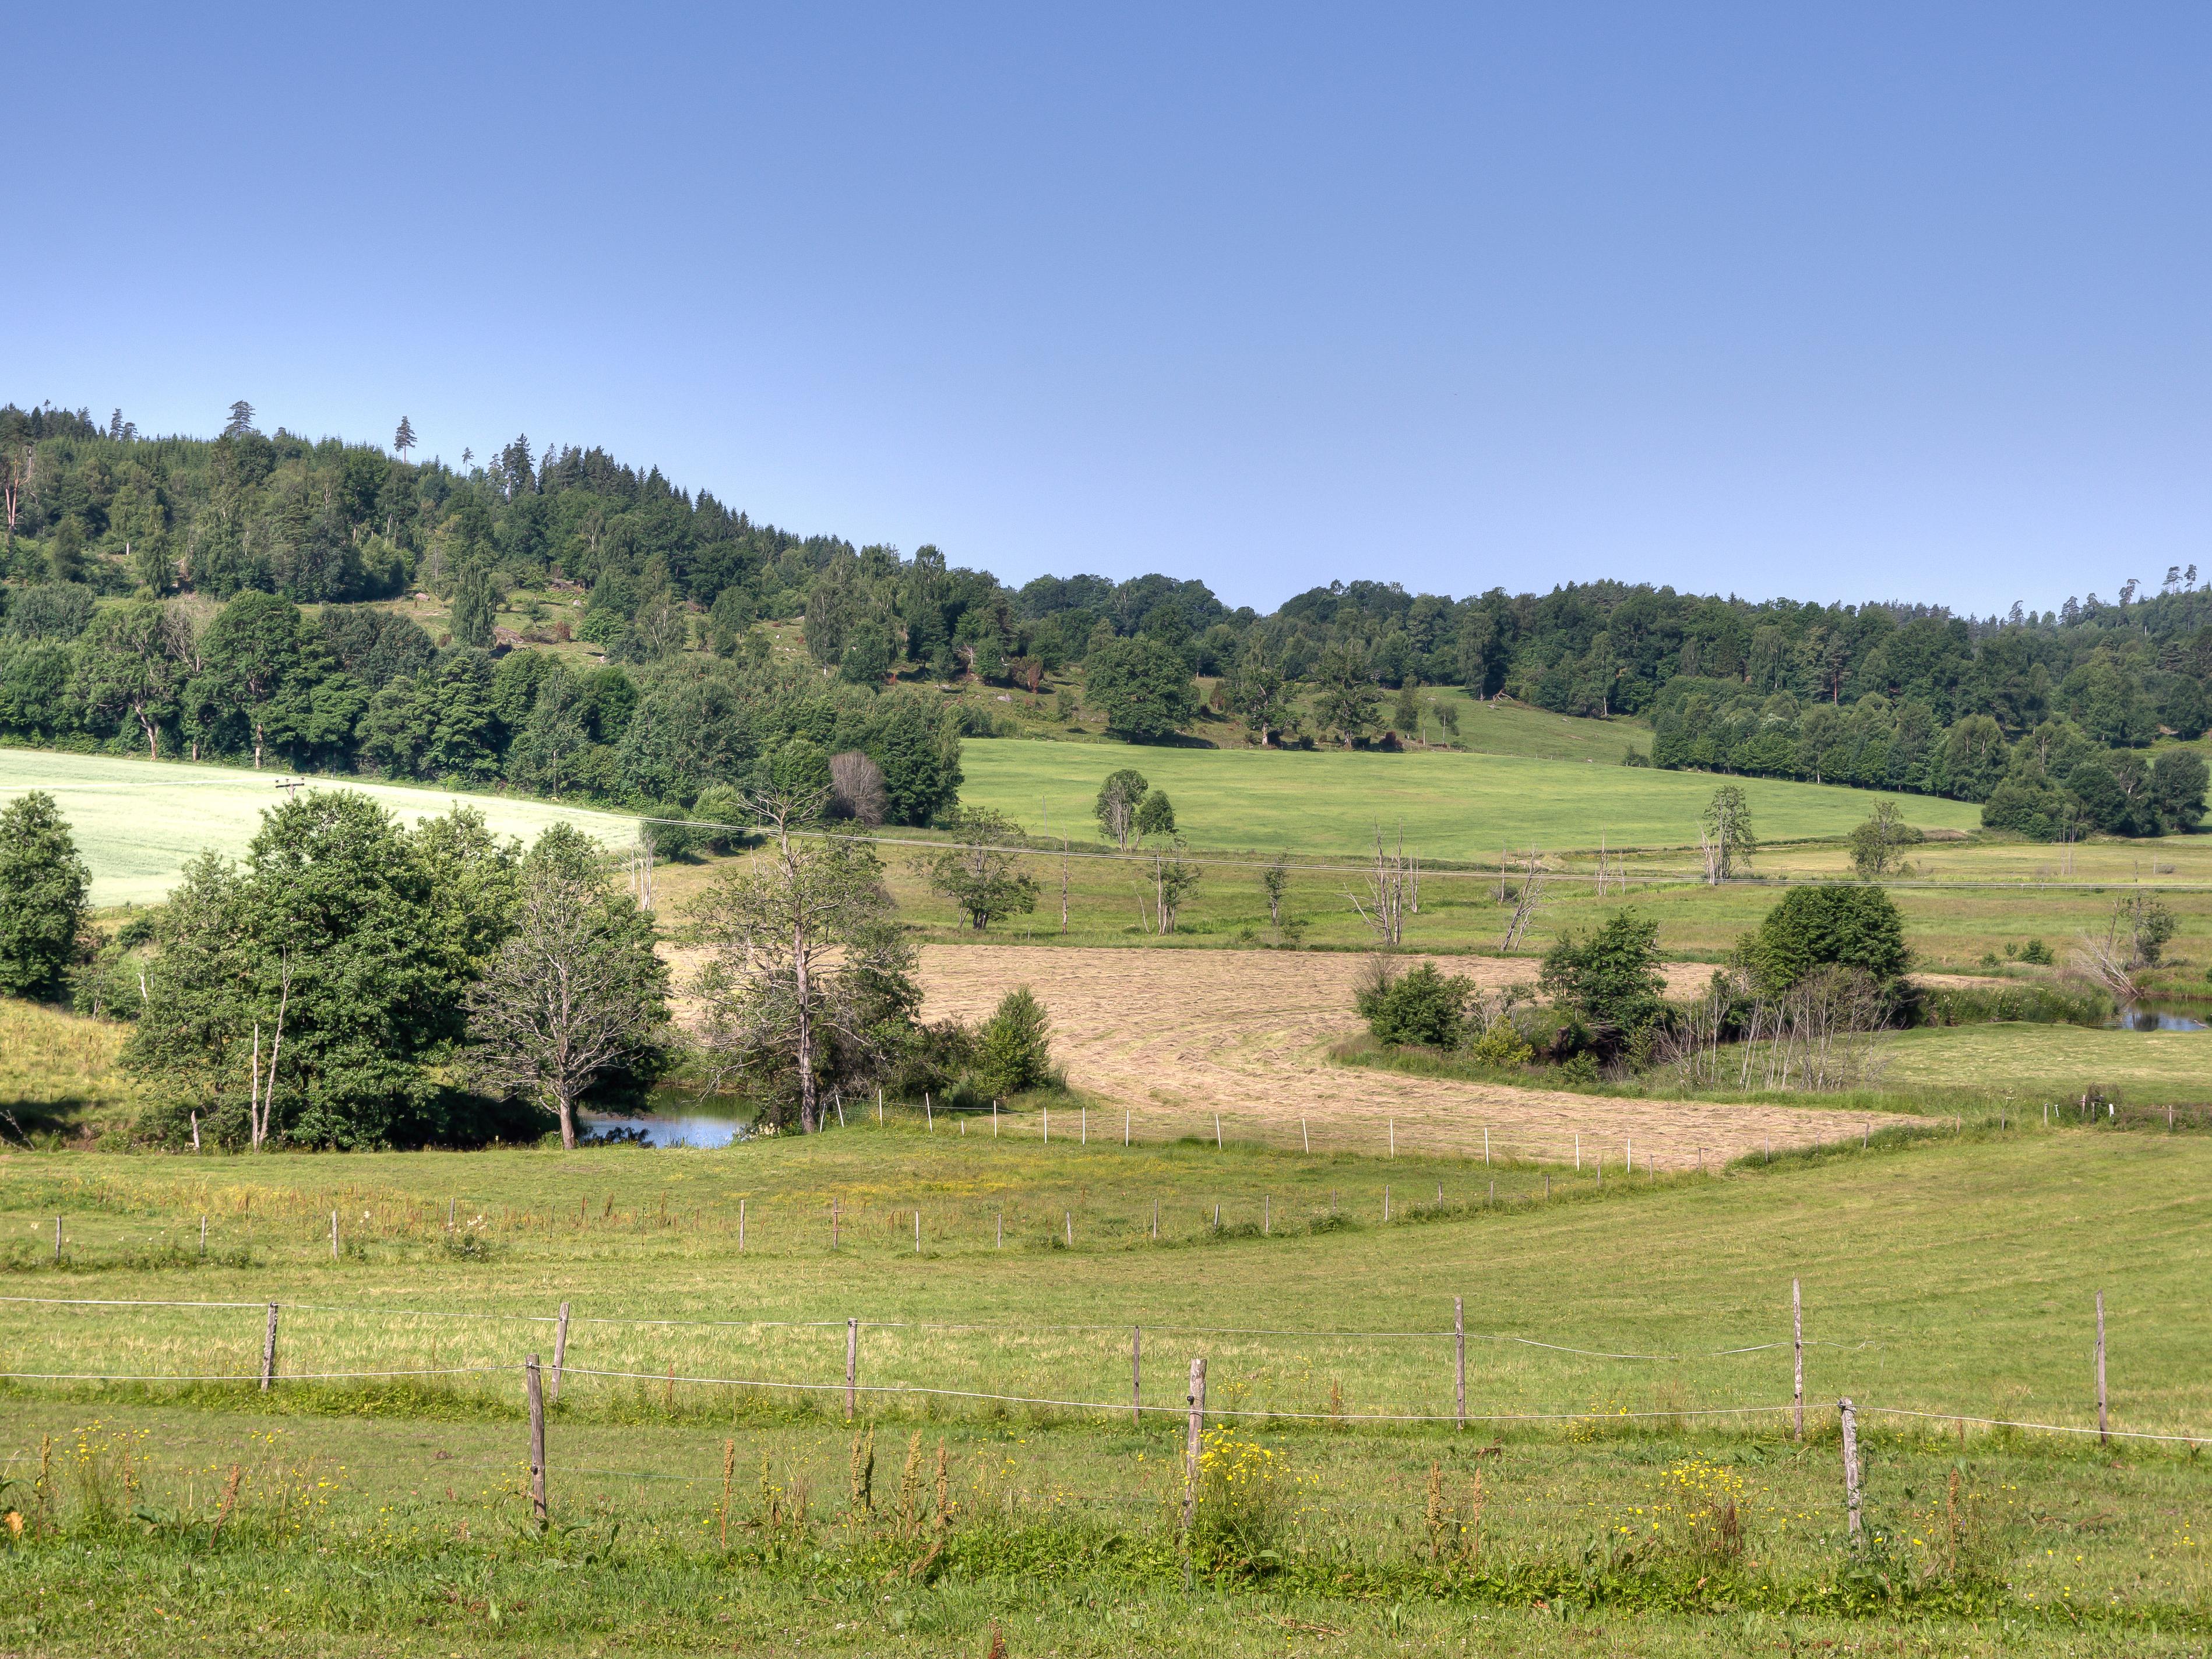 jordbruksmiljö om sommaren